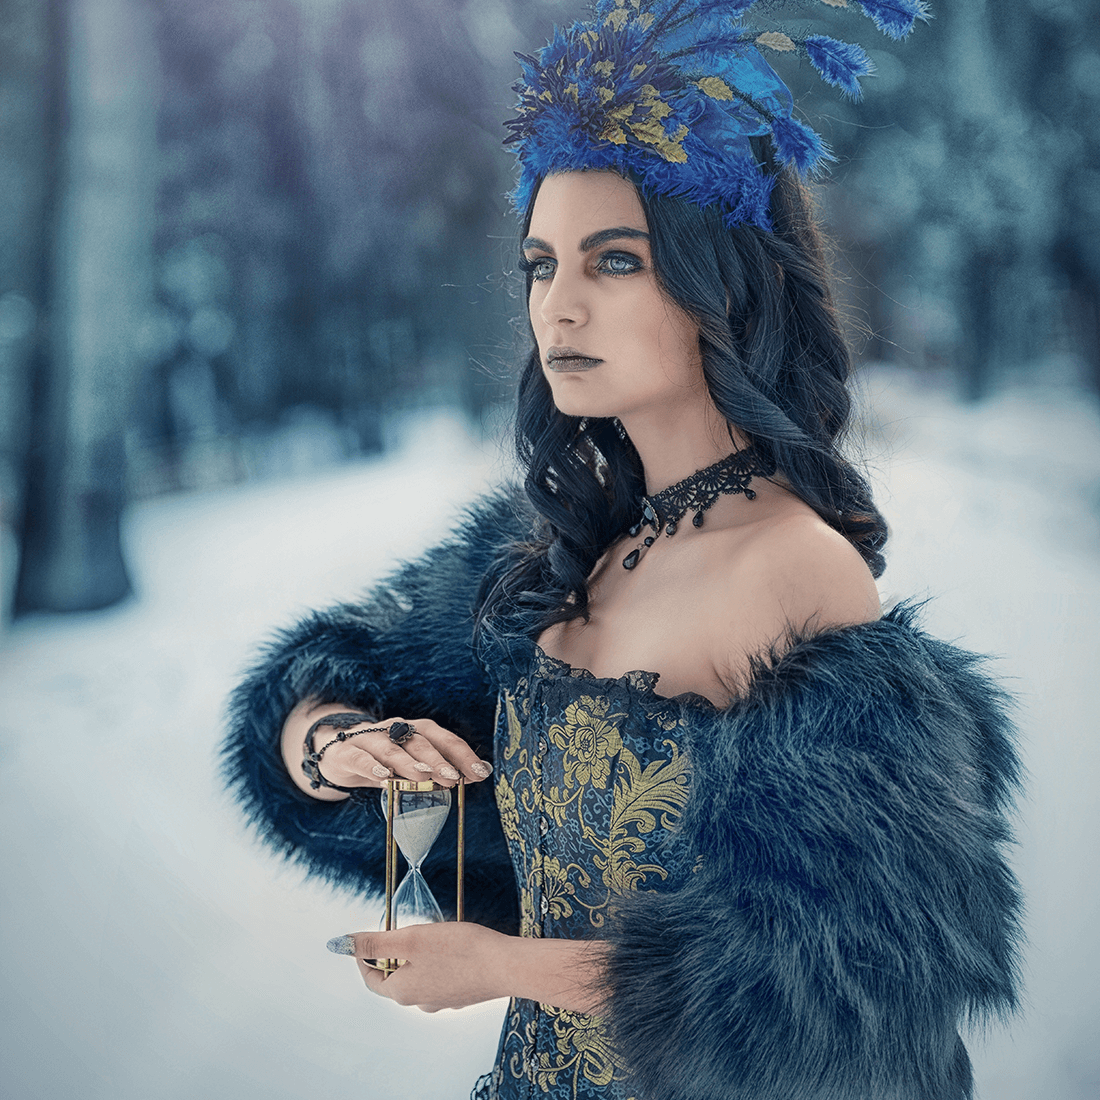 Focení temná královna, tmavý dramatický foto make-up